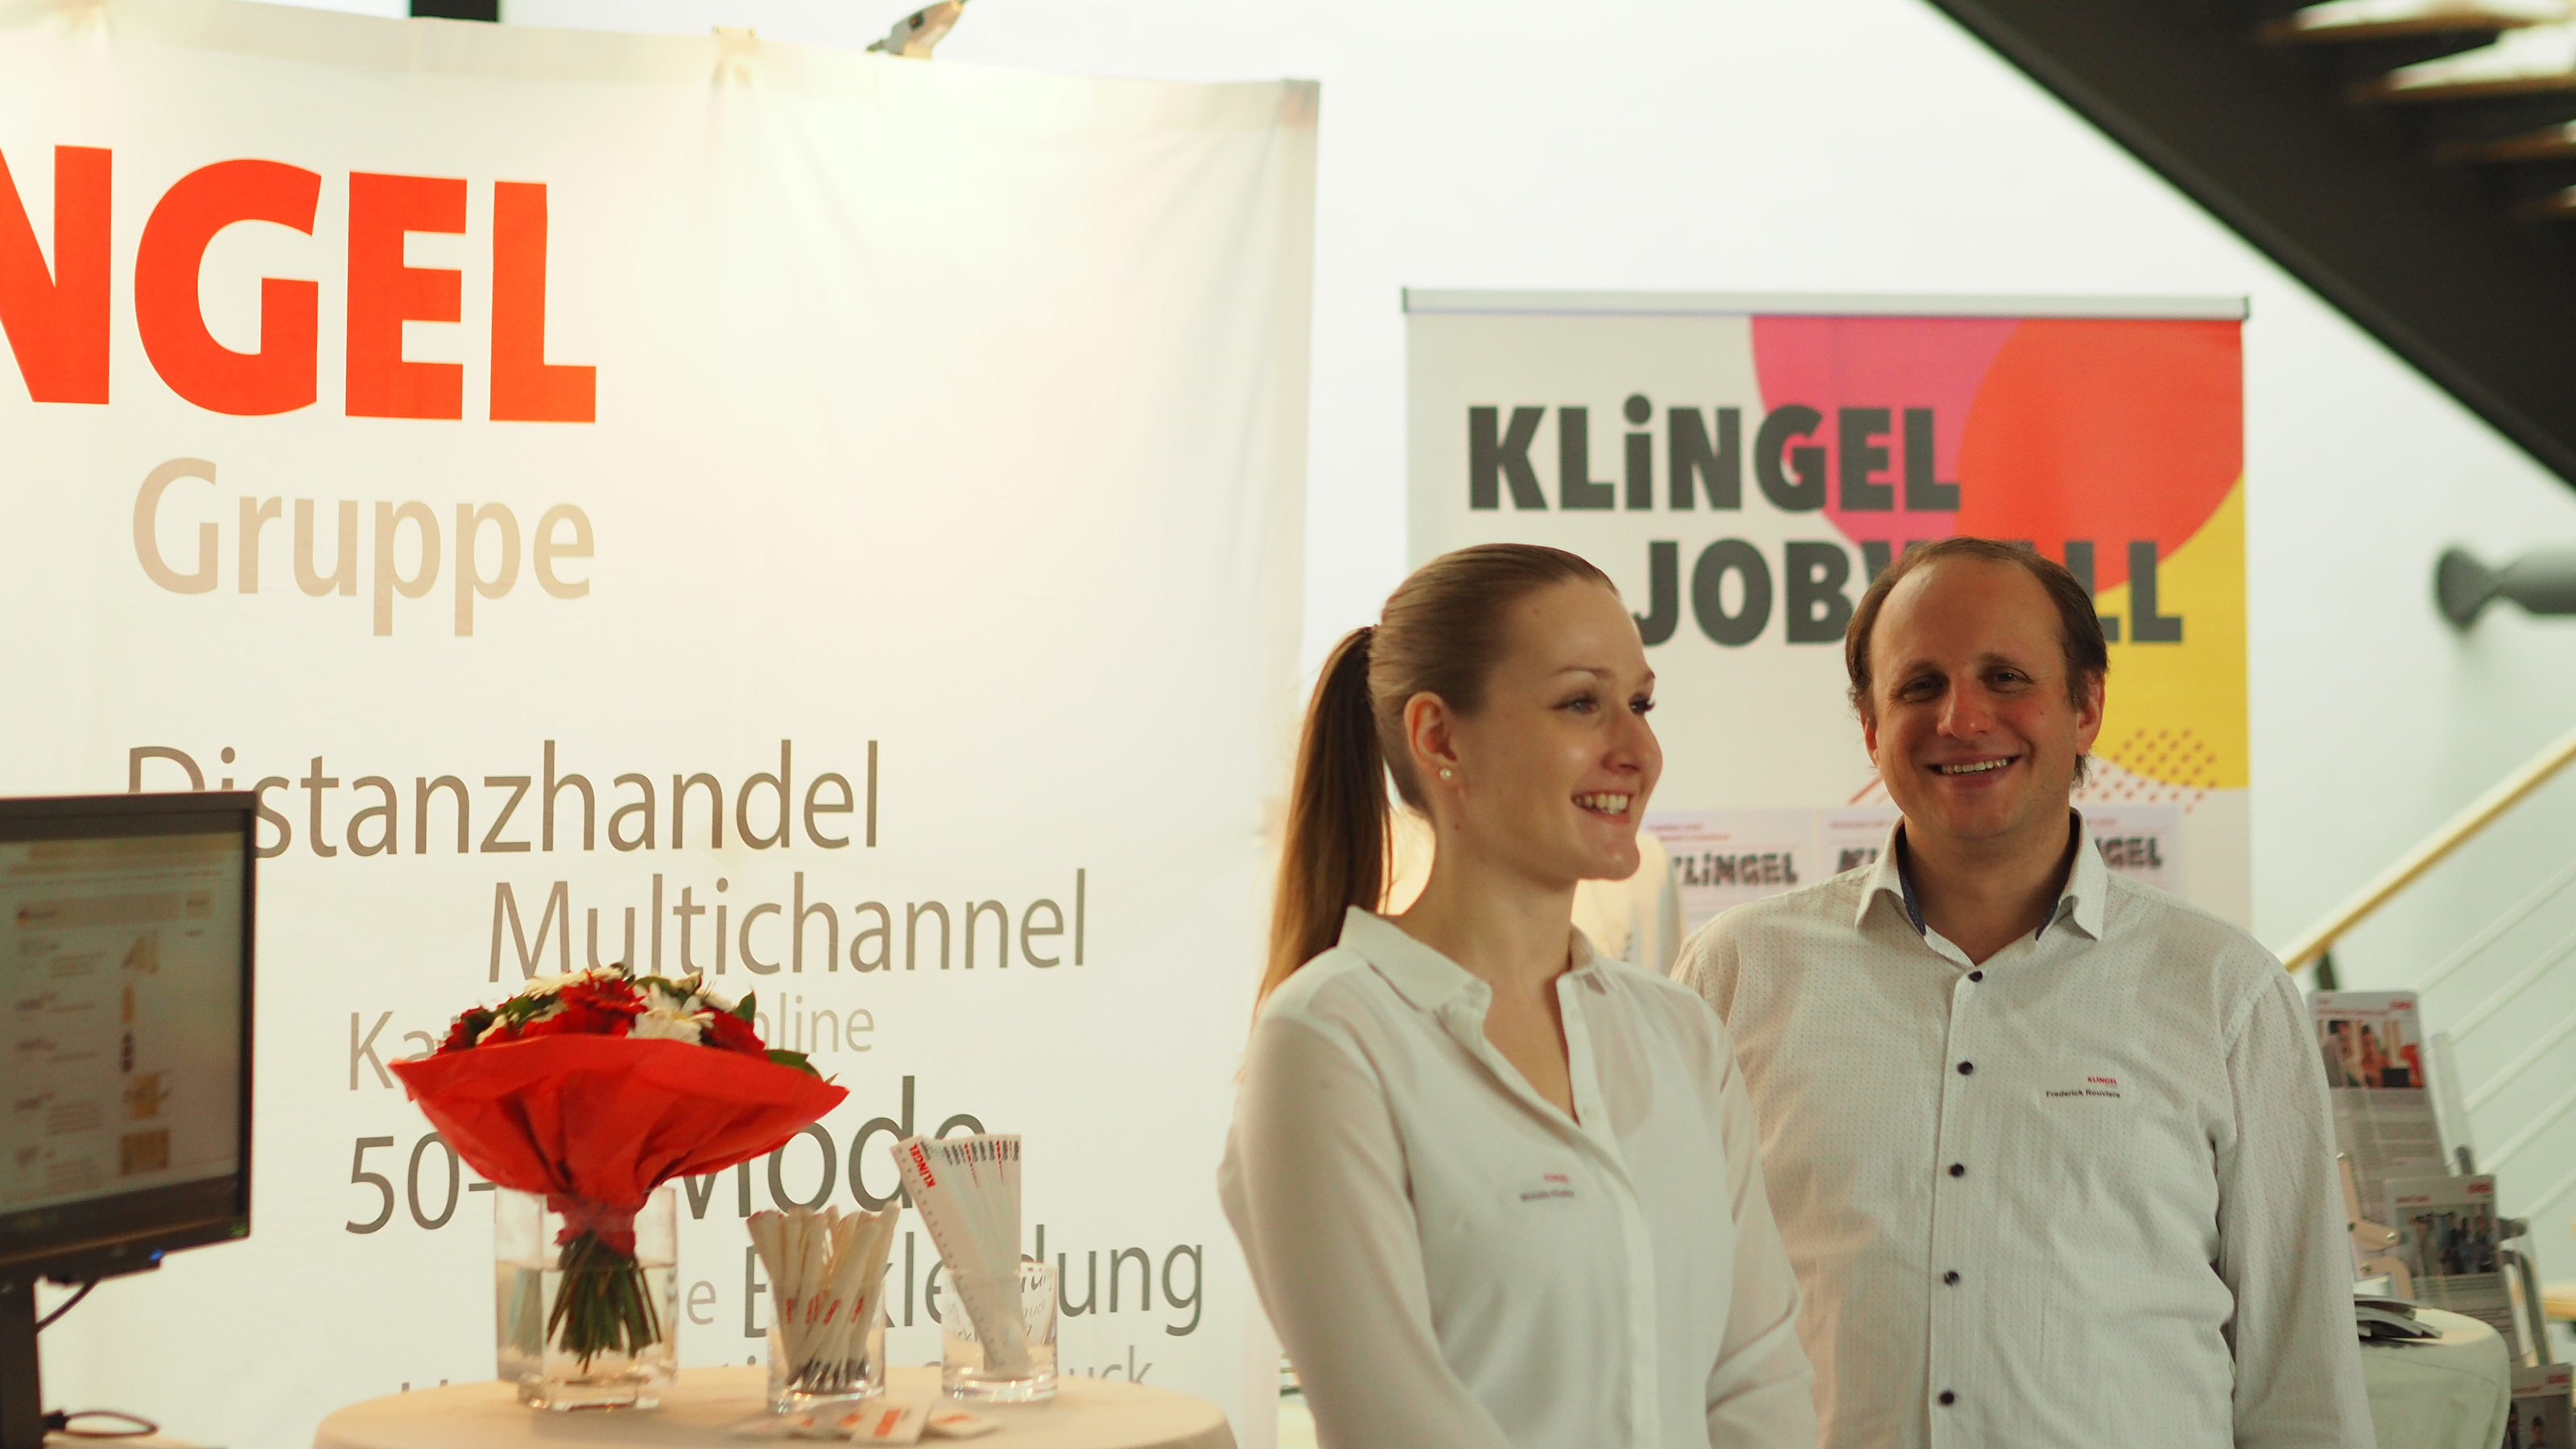 KLiNGEL_Events_KarriereMarktplatz